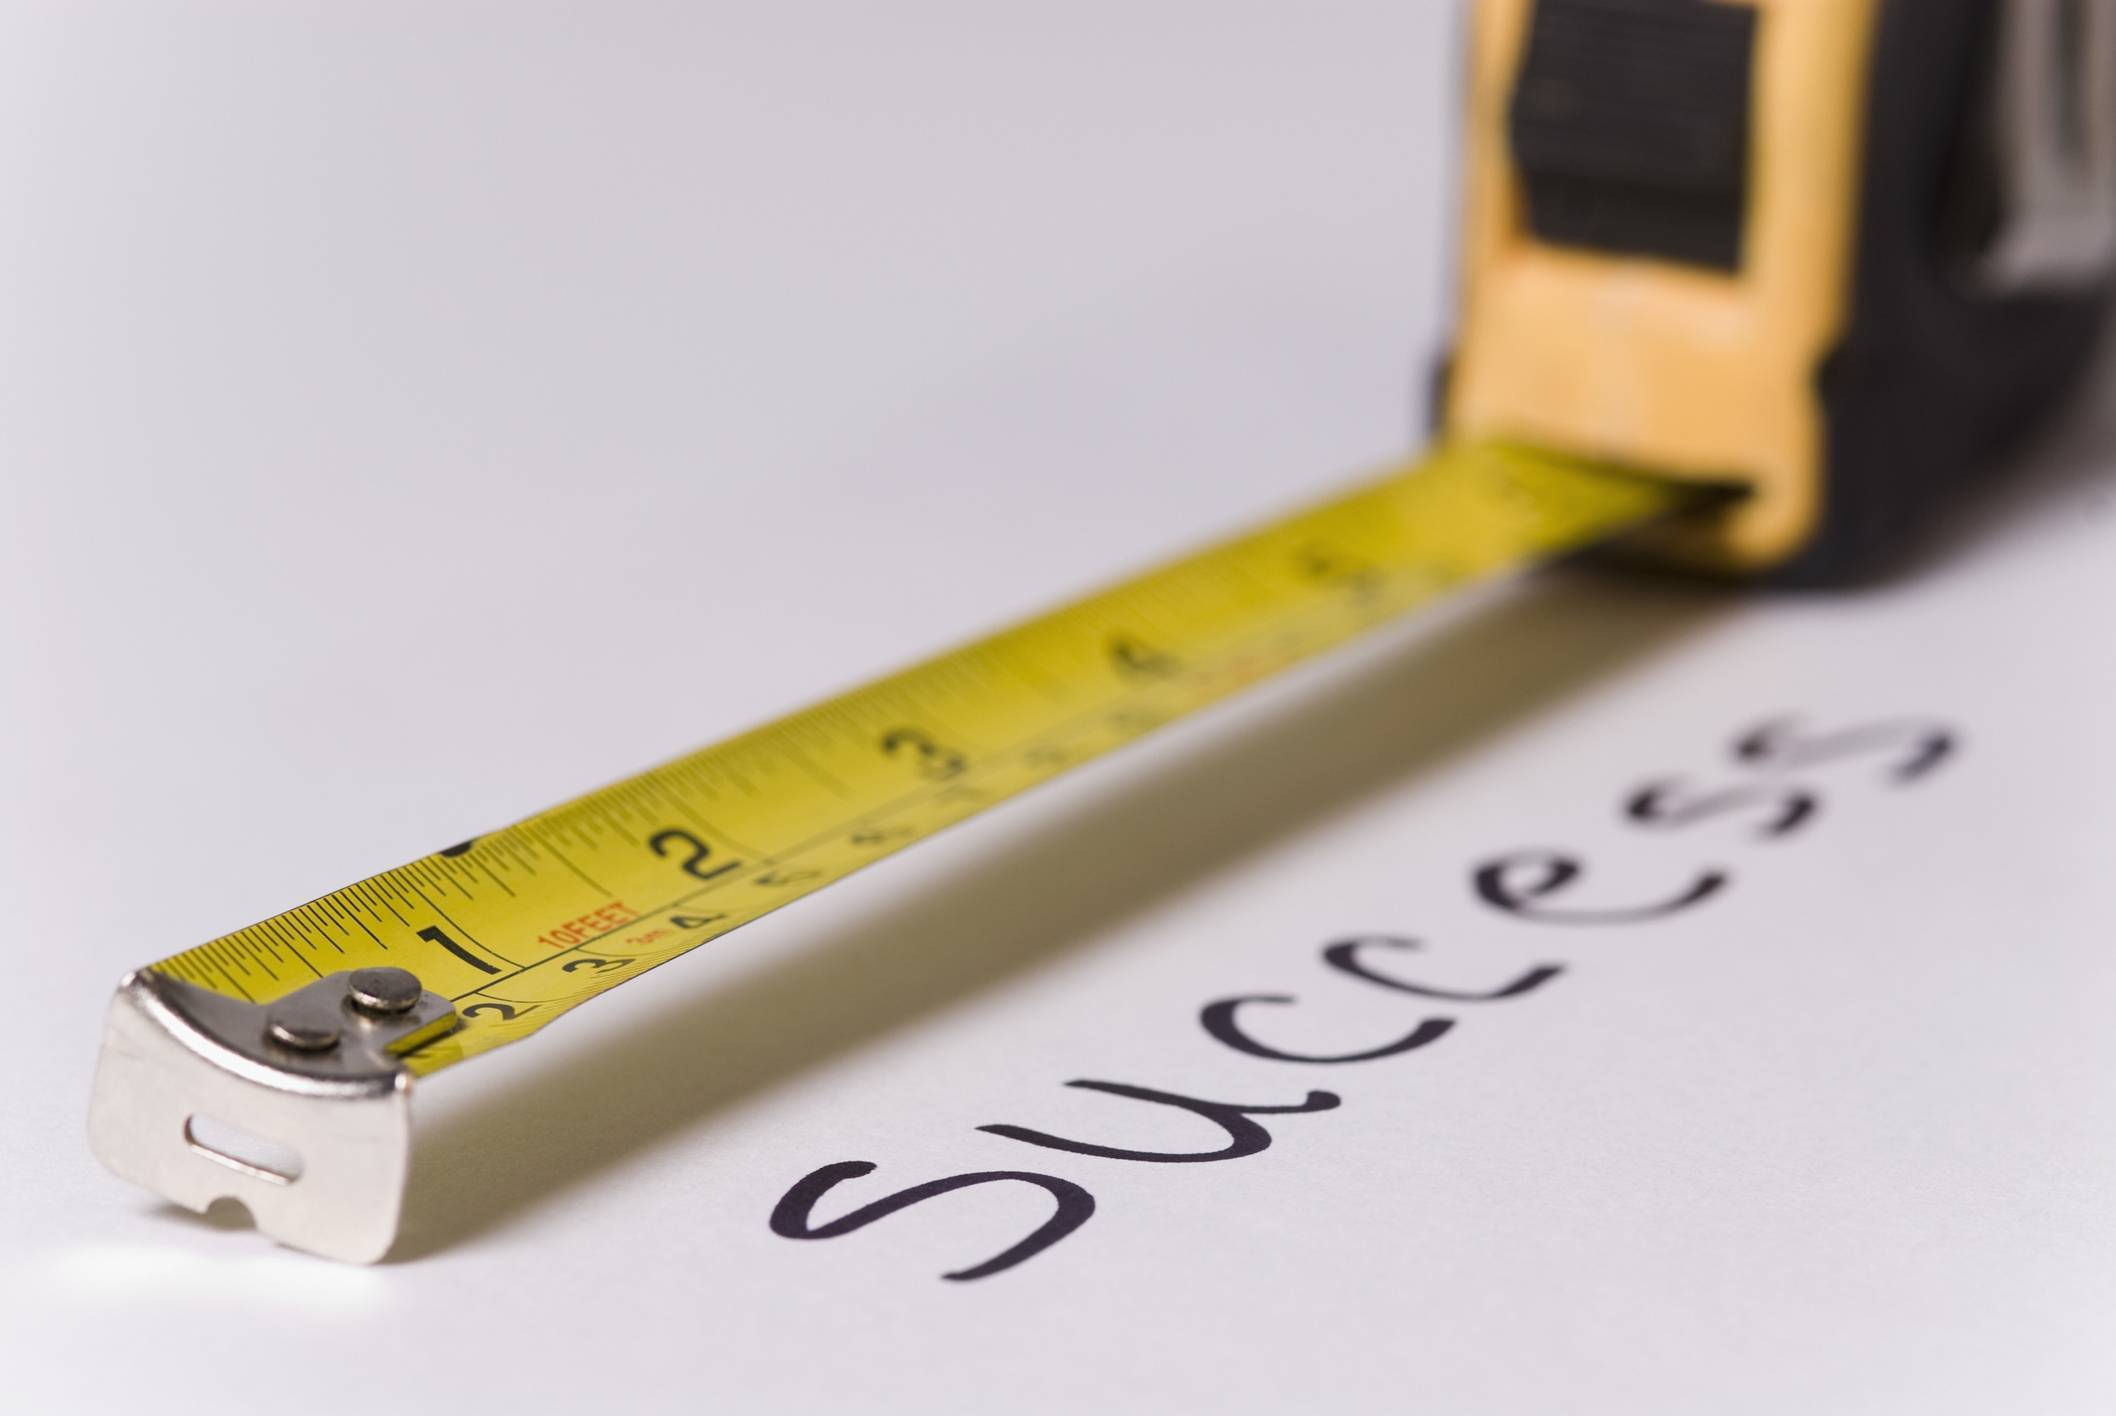 image of tape measure - B2B website sales funnels have measurable KPIs